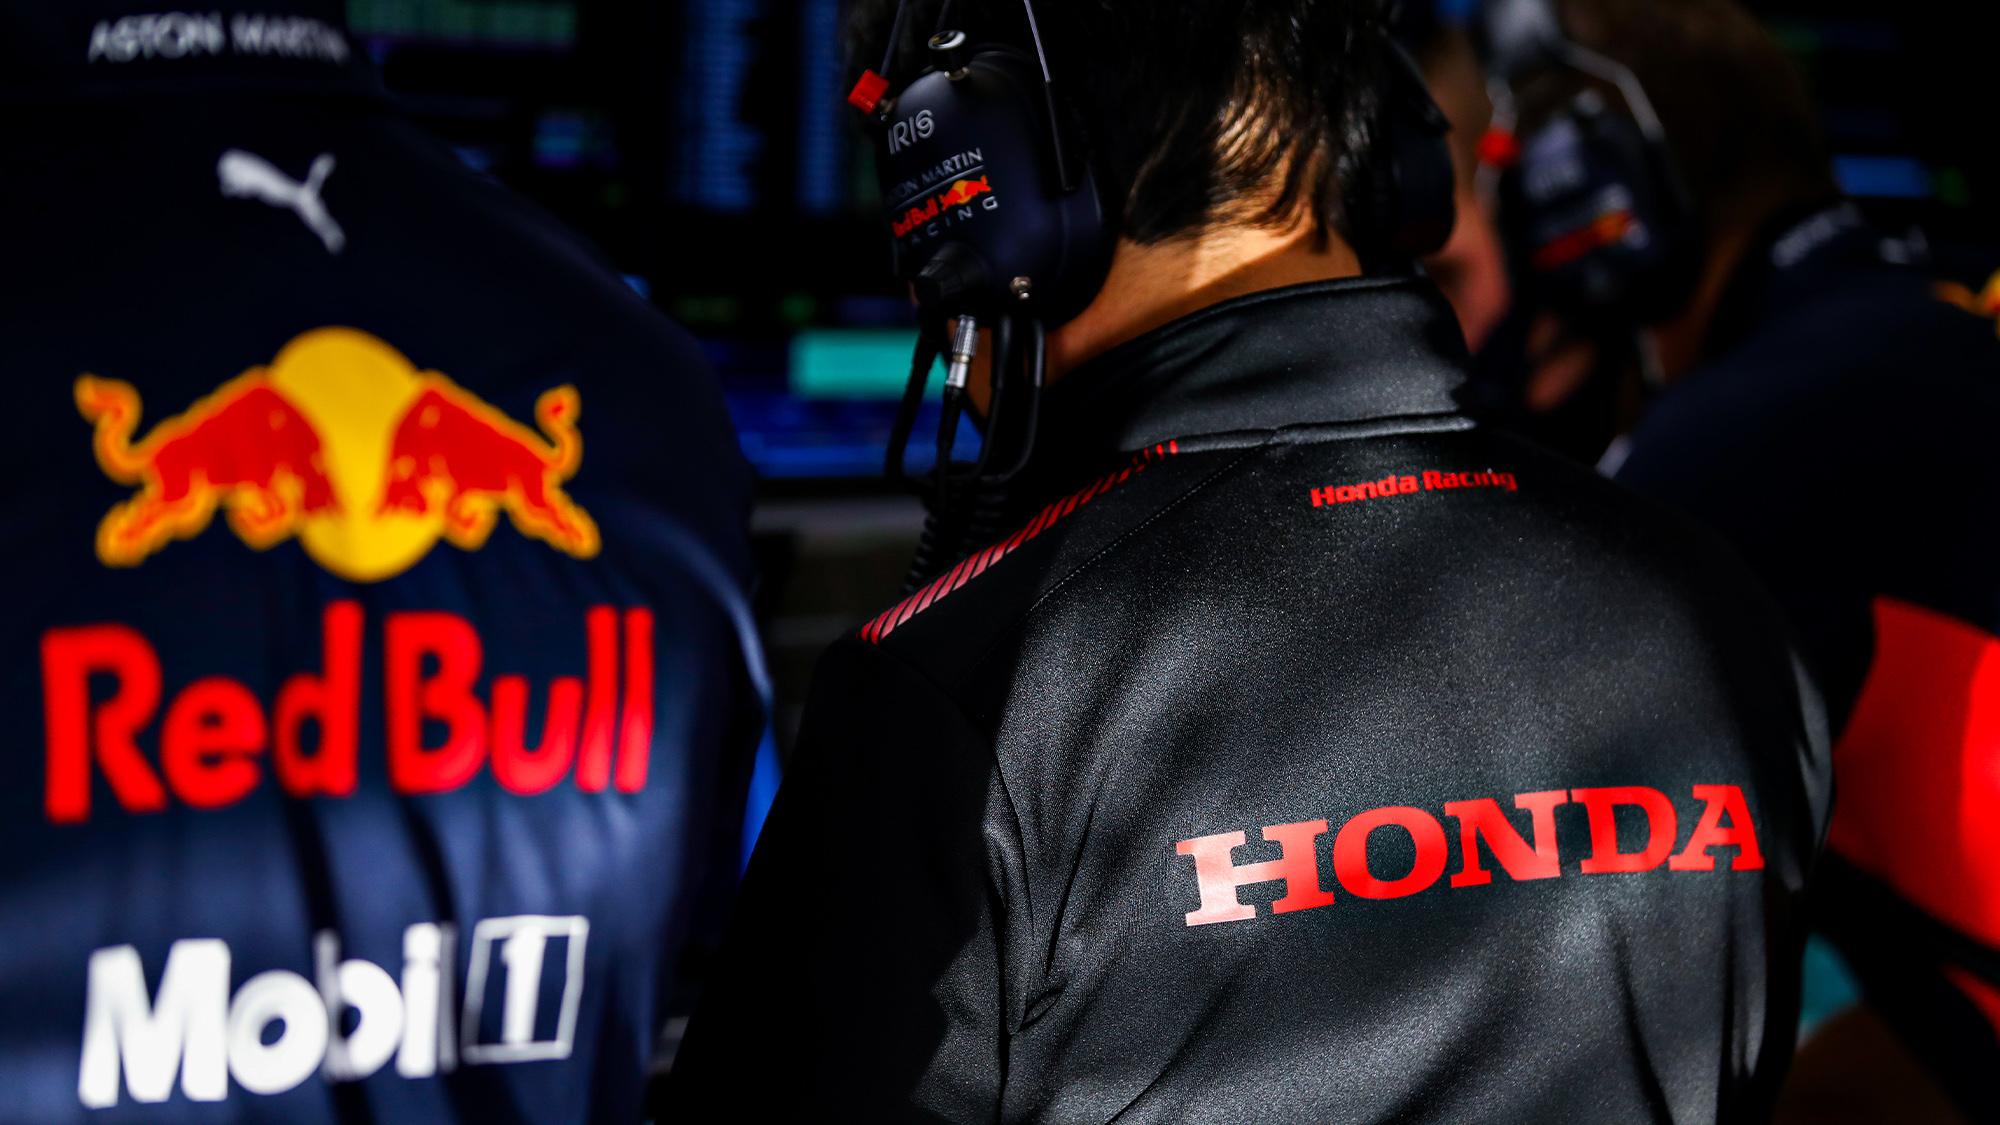 Red Bull and Honda F1 jackets